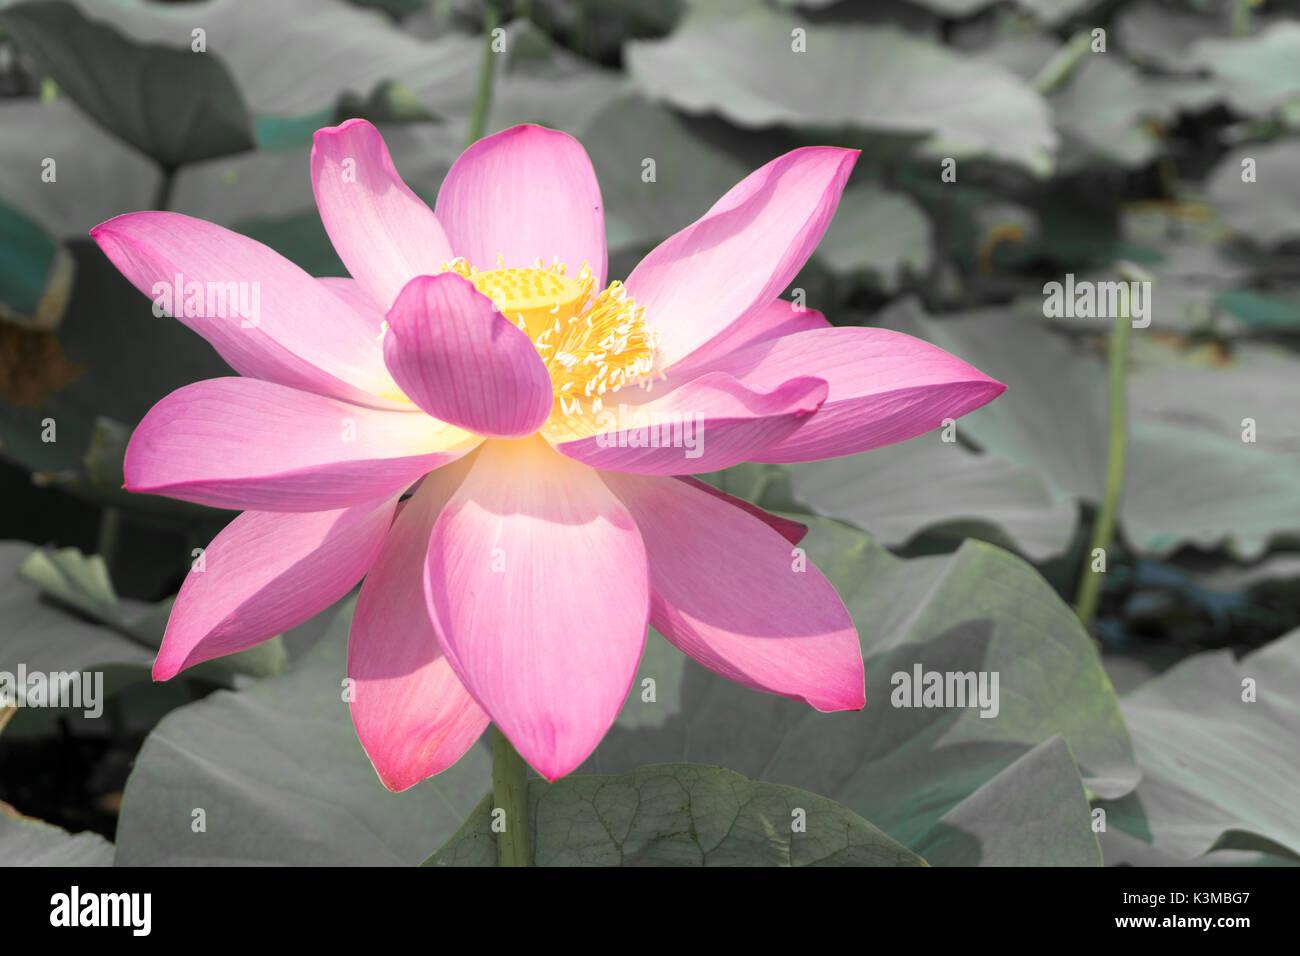 Flower Sacred Lotus Effect Stock Photos Flower Sacred Lotus Effect